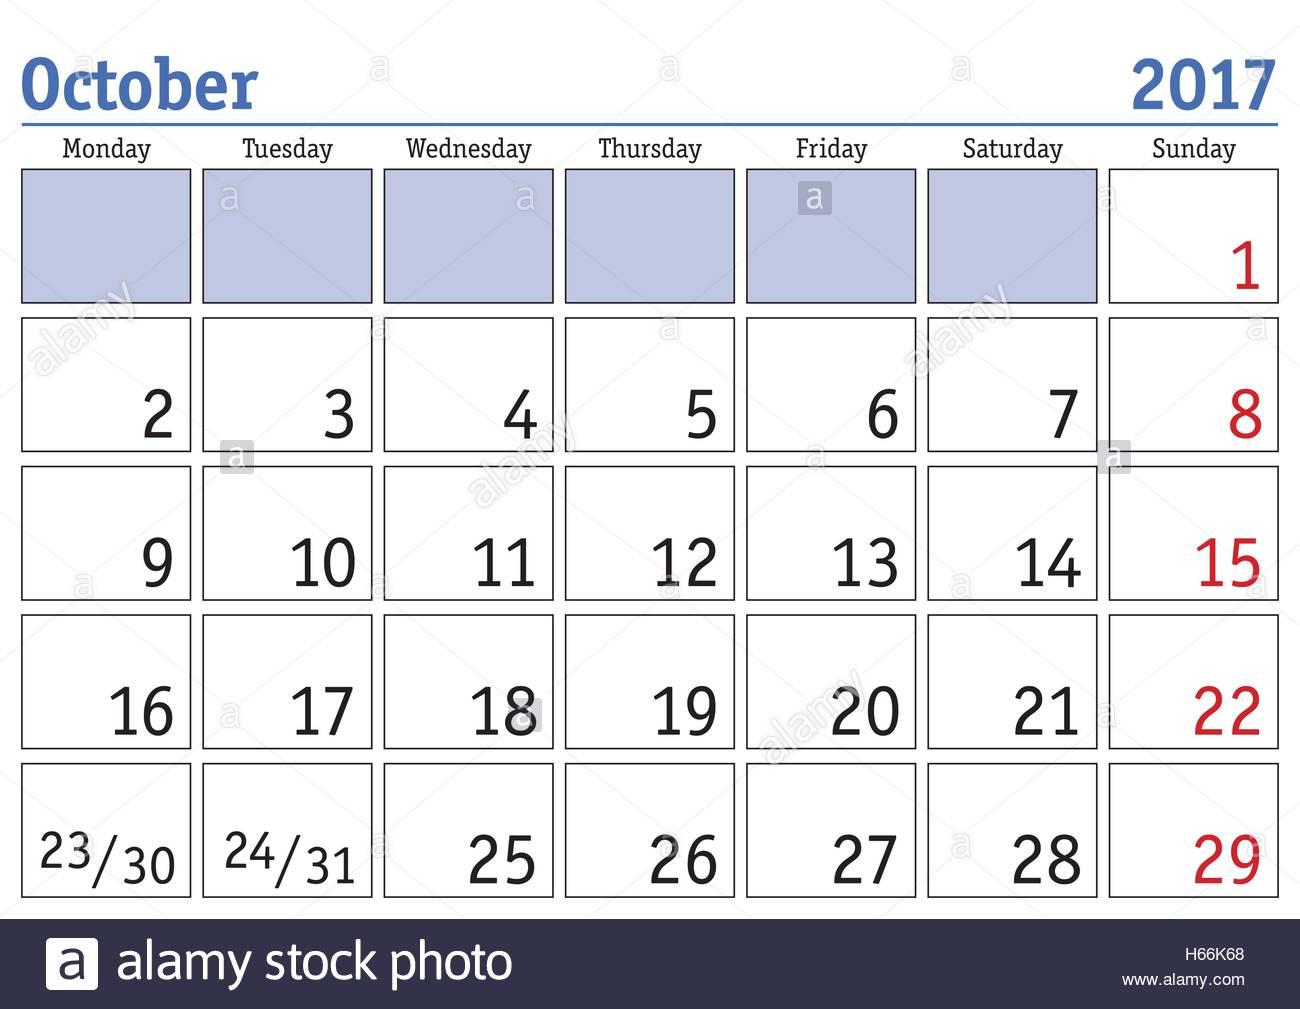 Simple Digital Calendar For October 2017. Vector Printable